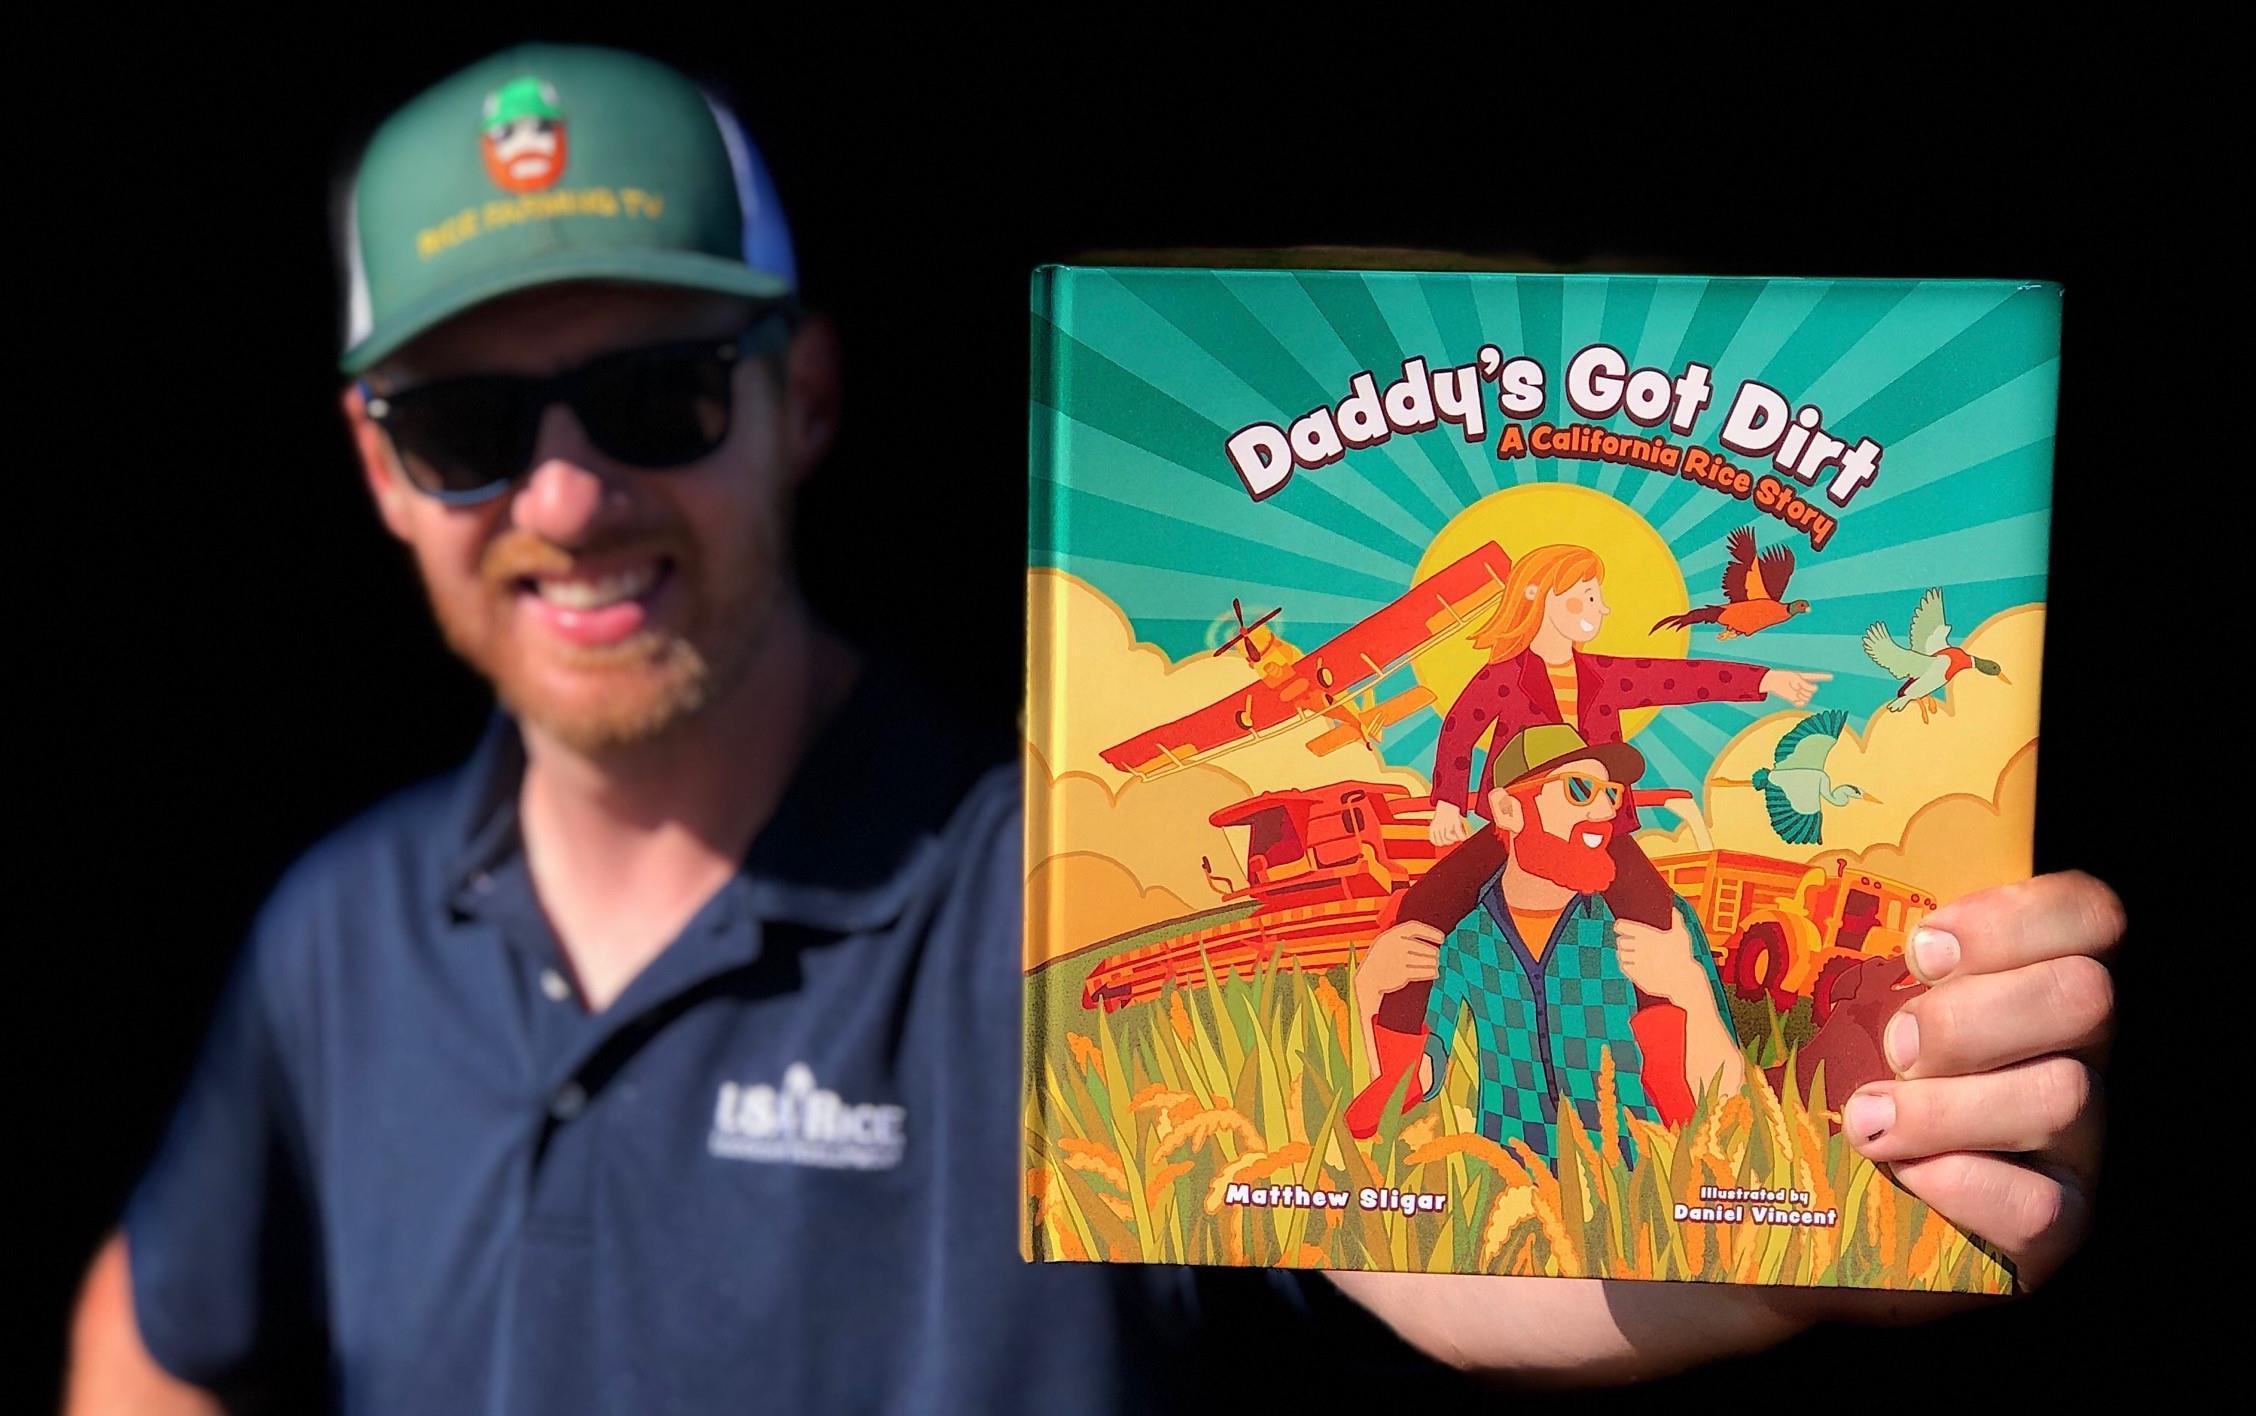 White man wearing ballcap holds childrens book, Daddy